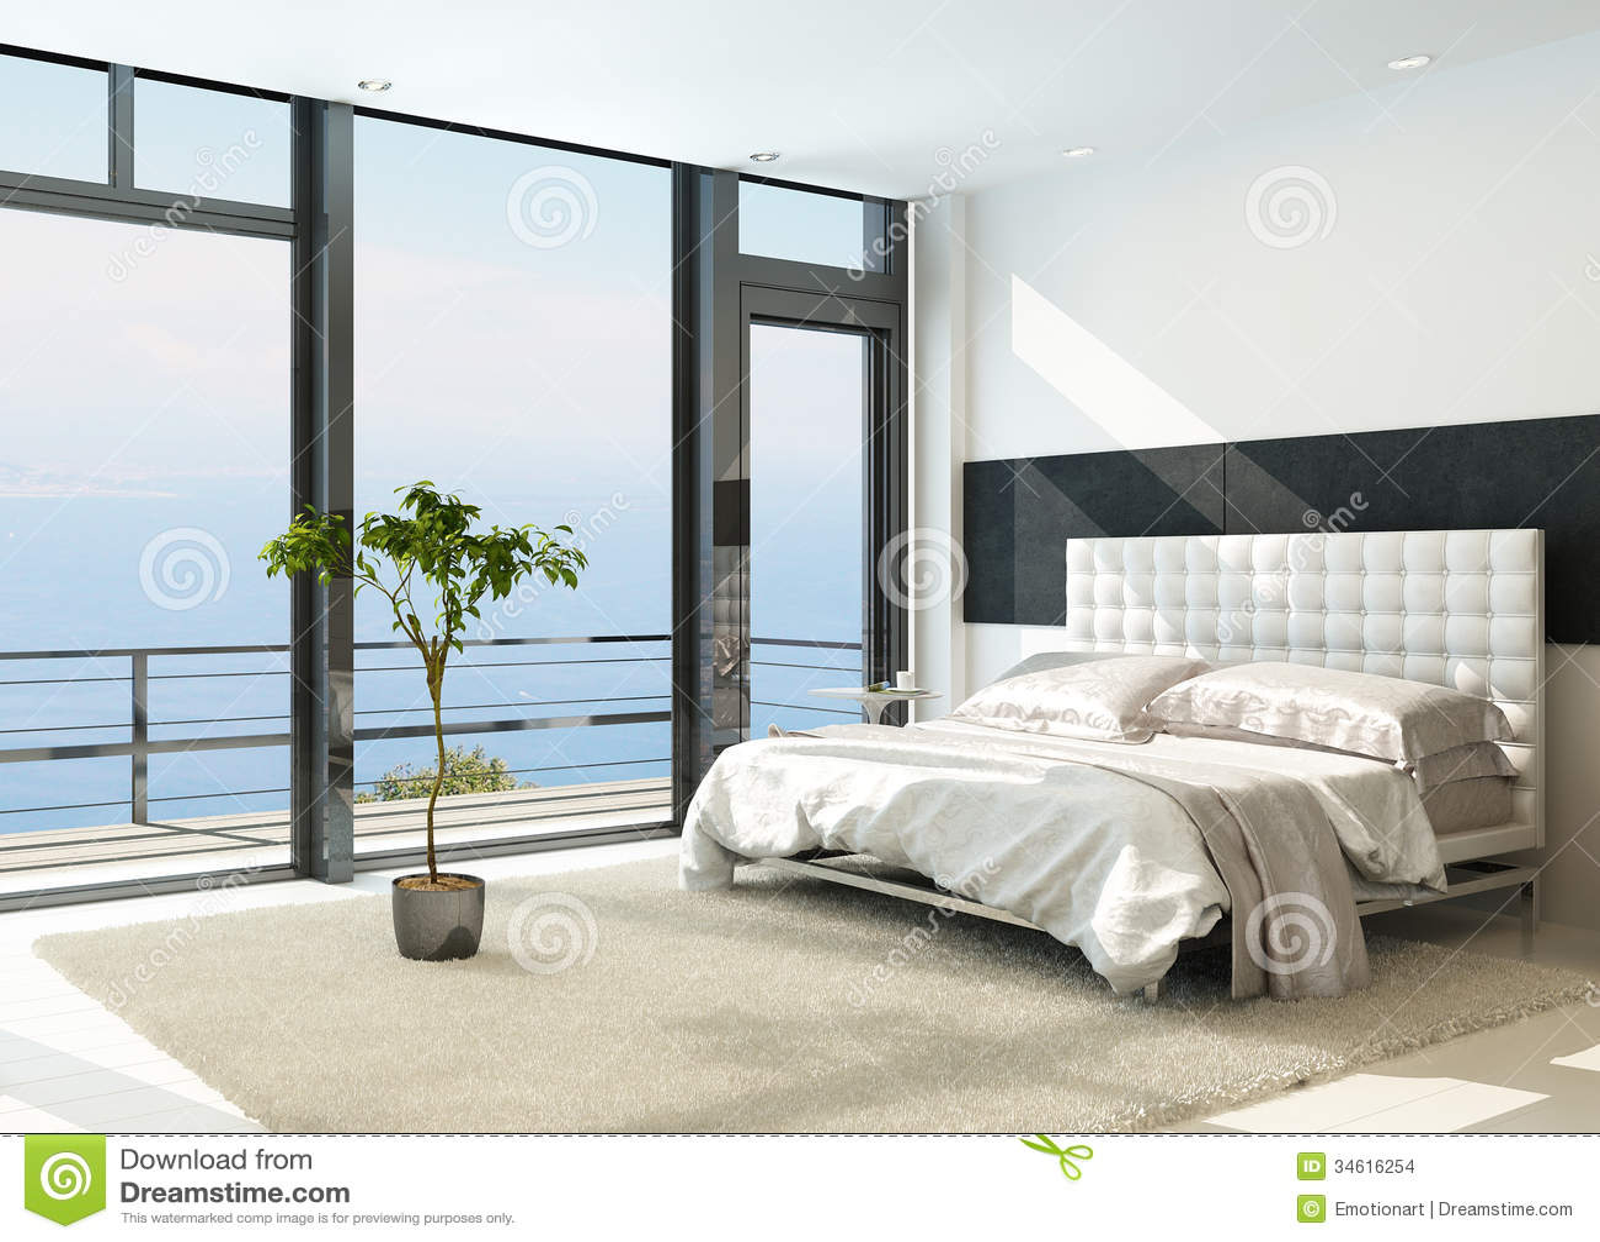 Contemporary modern sunny bedroom interior with huge windows